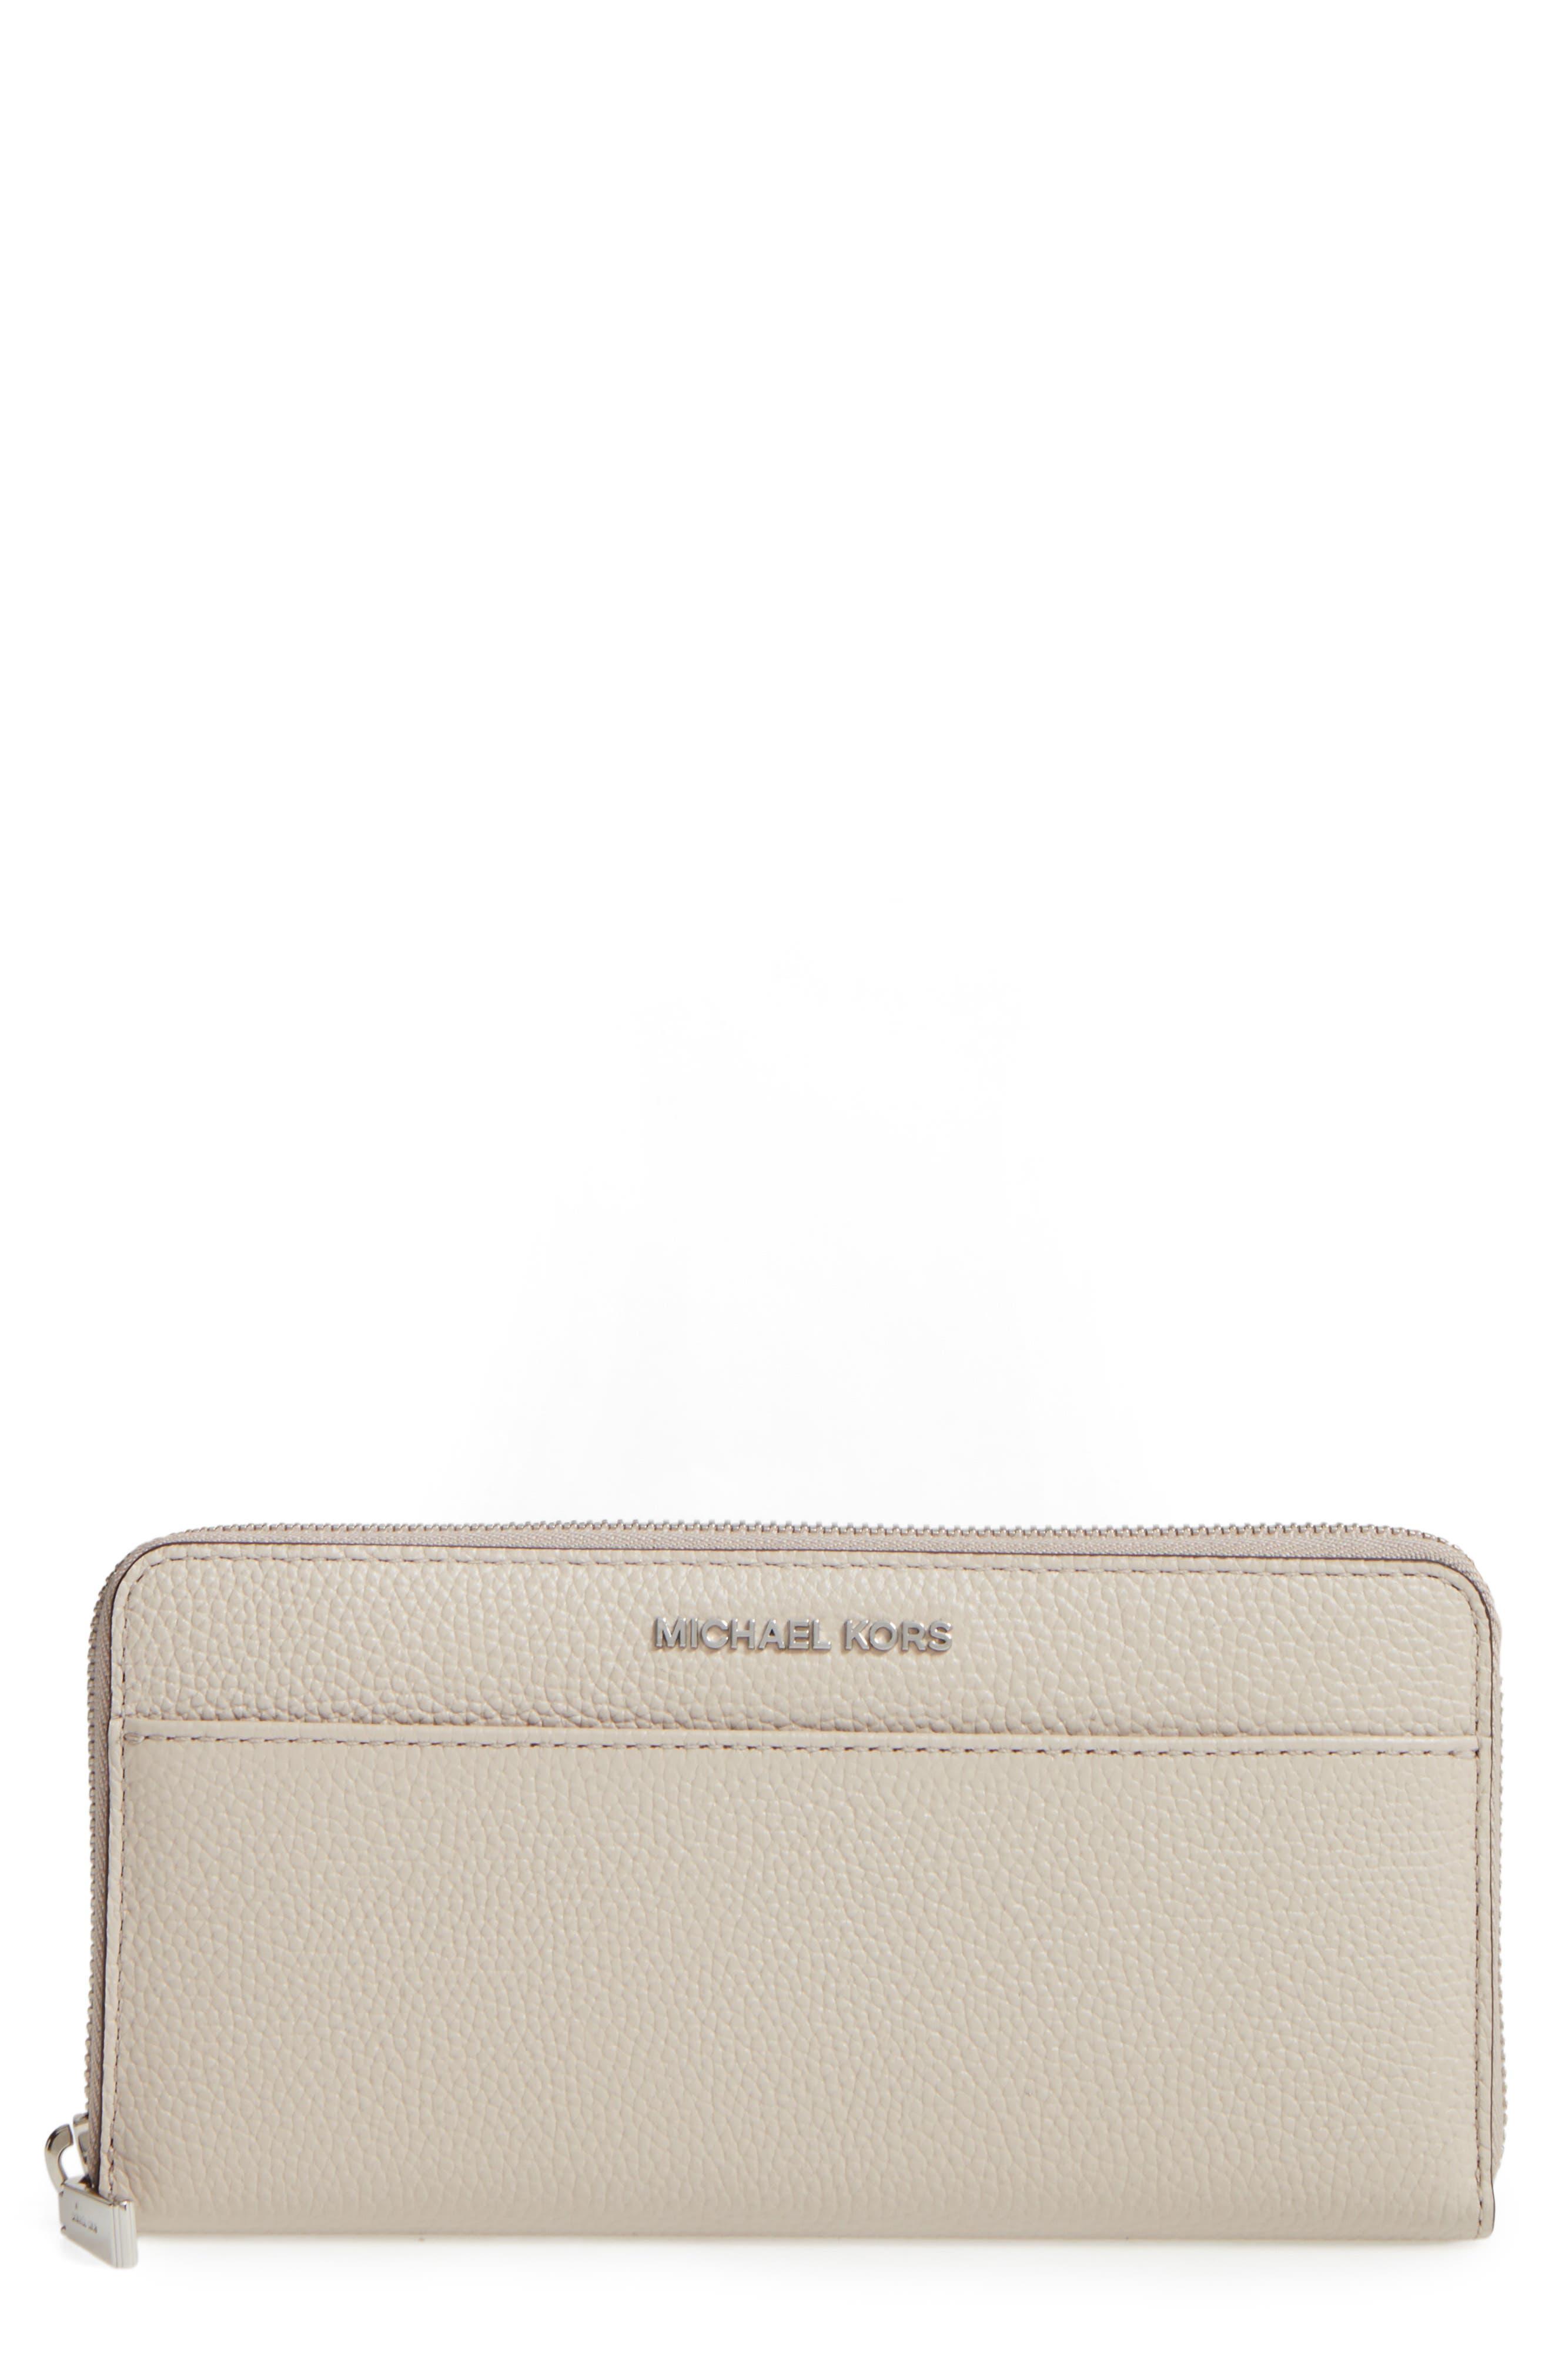 MICHAEL Michael Kors Mercer Leather Continental Wallet